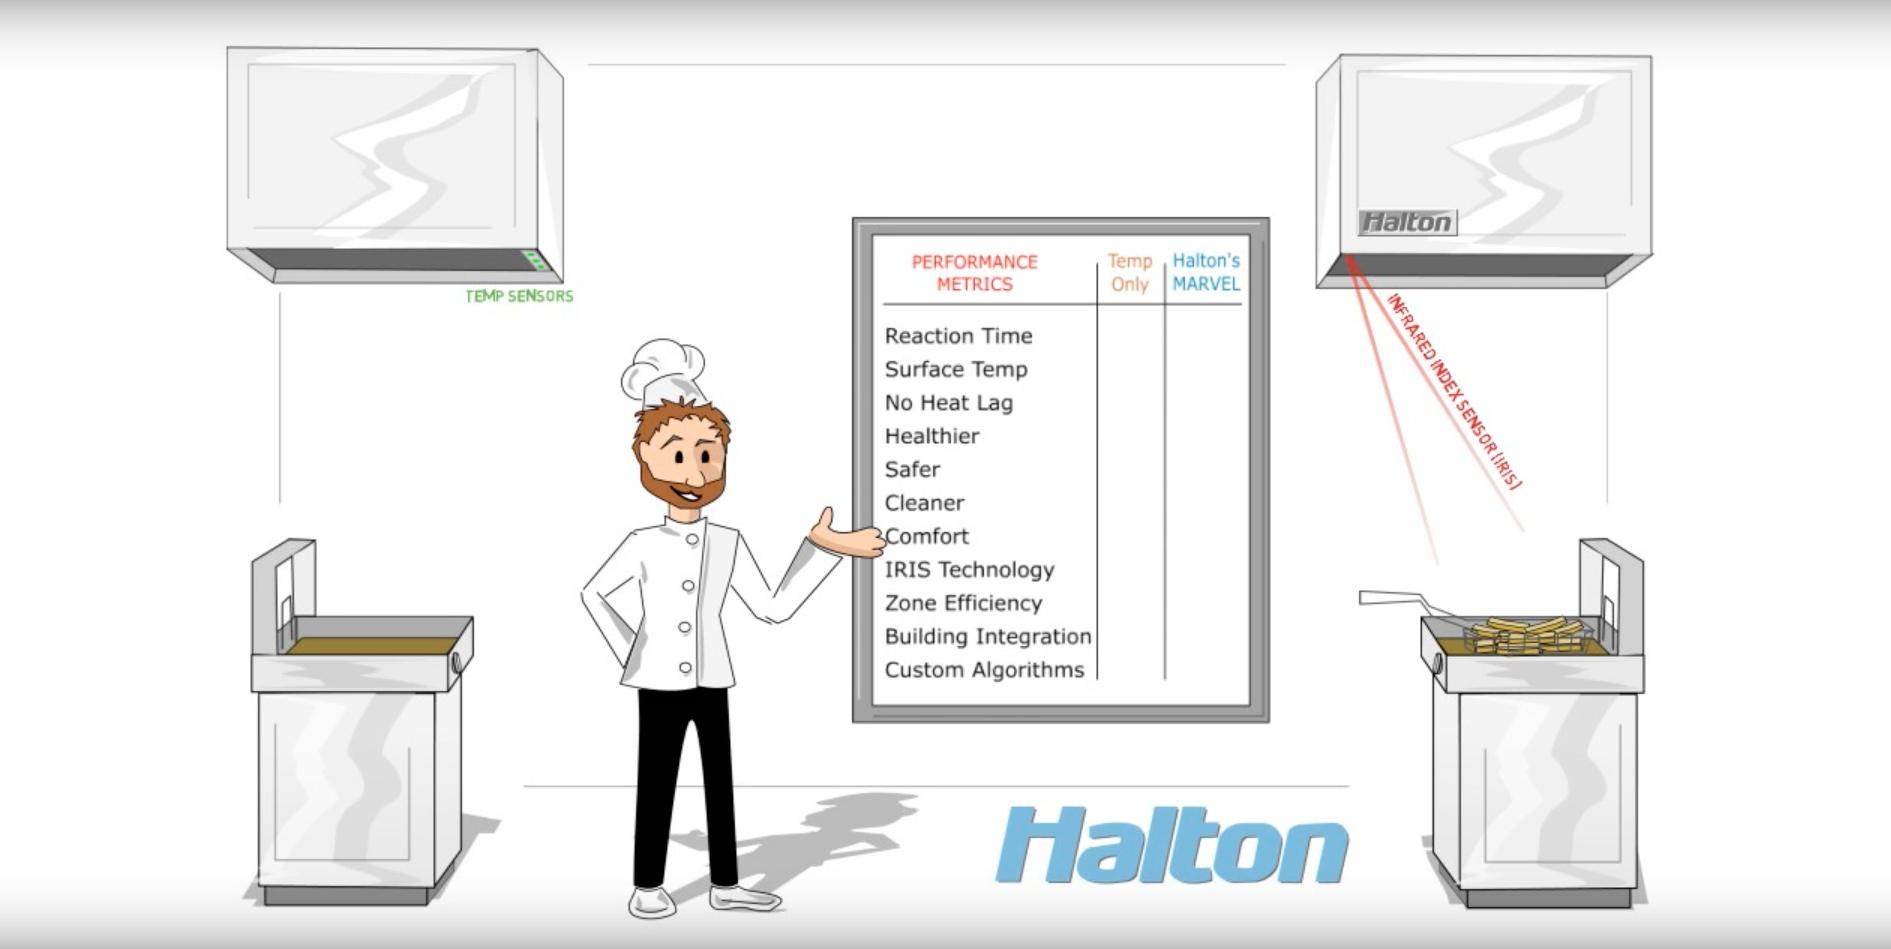 Comparing Halton's MARVEL vs Temp-Only Kitchen Ventilation Systems.png